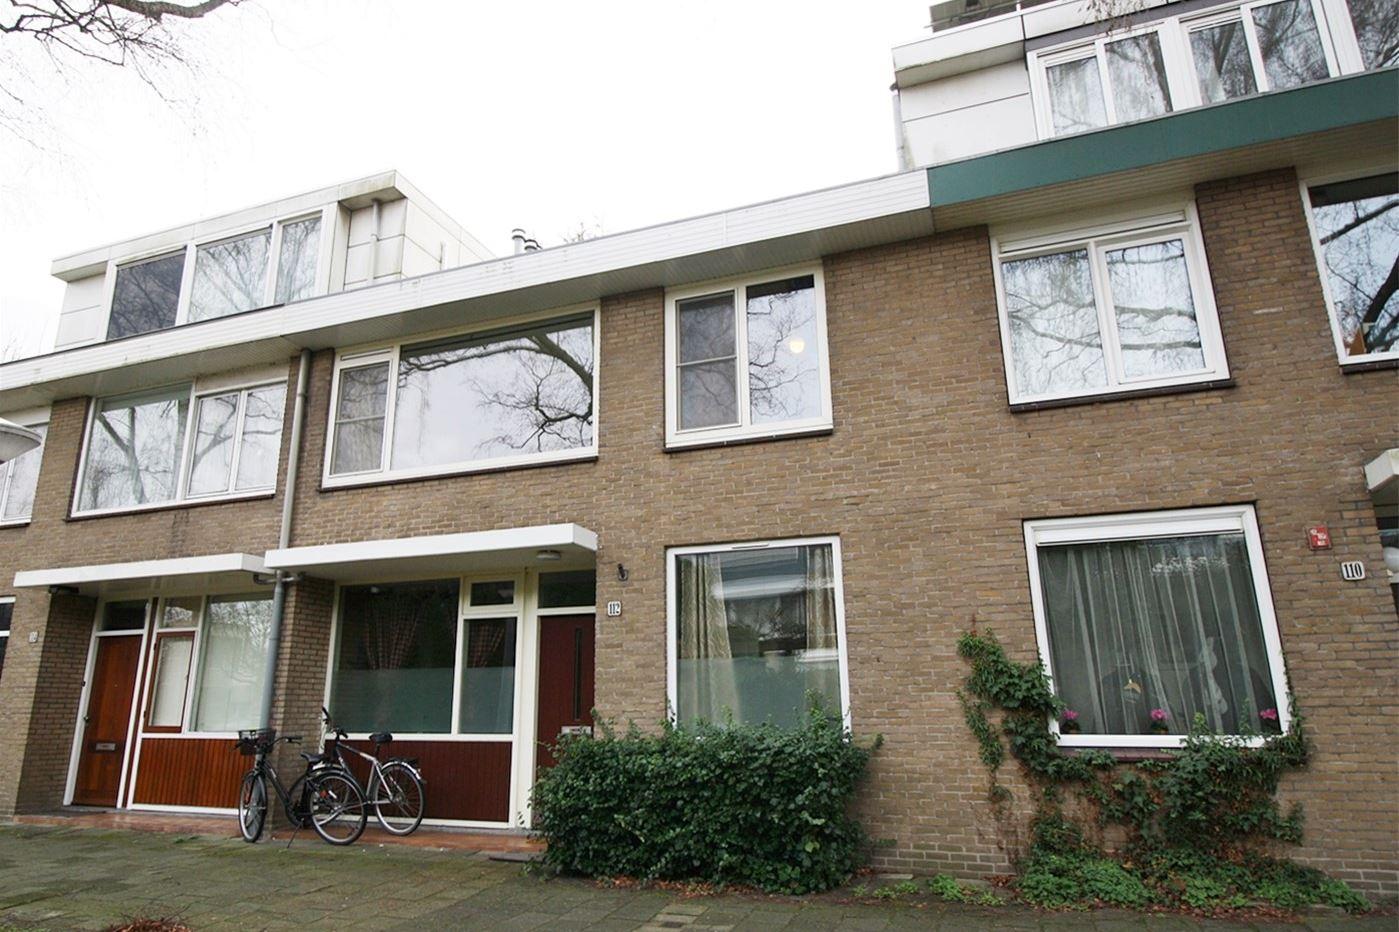 Huizen Huren Amsterdam : Huis te huur soetendaal br amsterdam funda